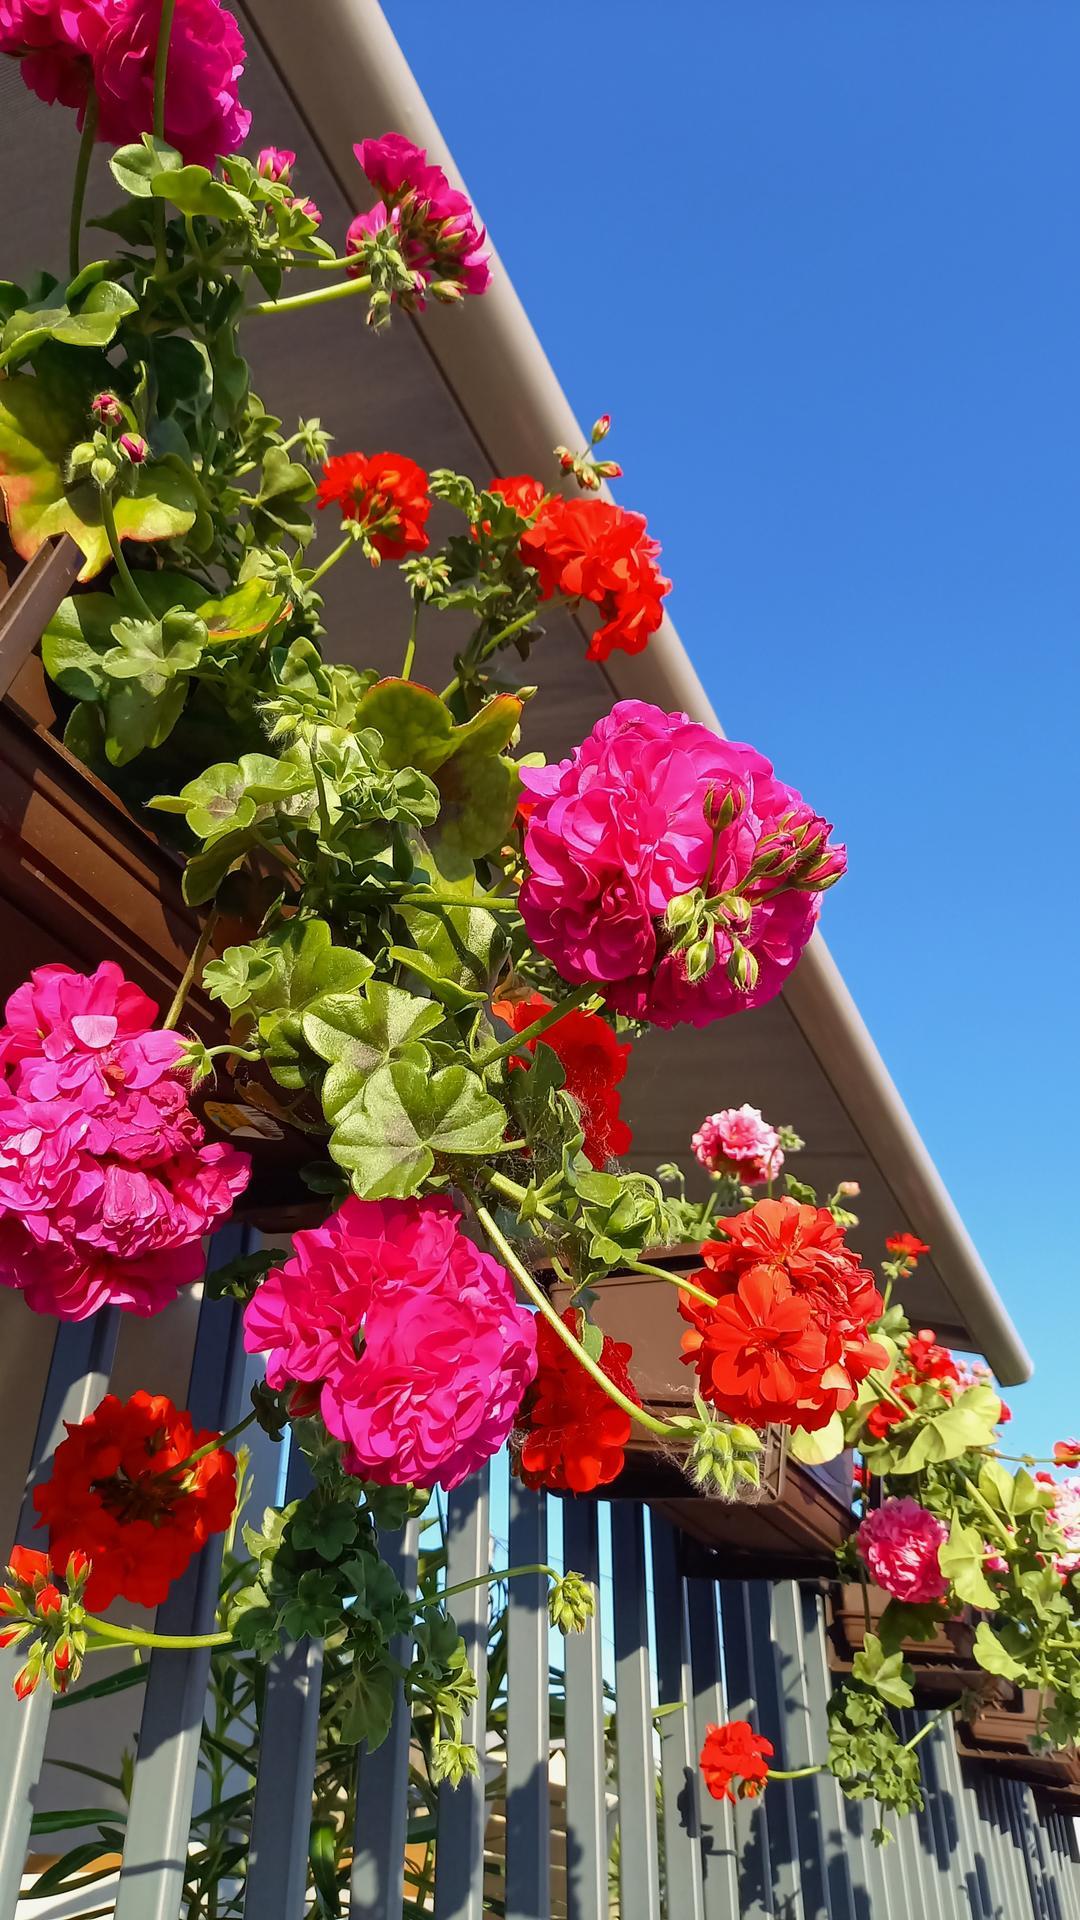 Zahrada - Muskaty na teraske sa pekne roziehaju